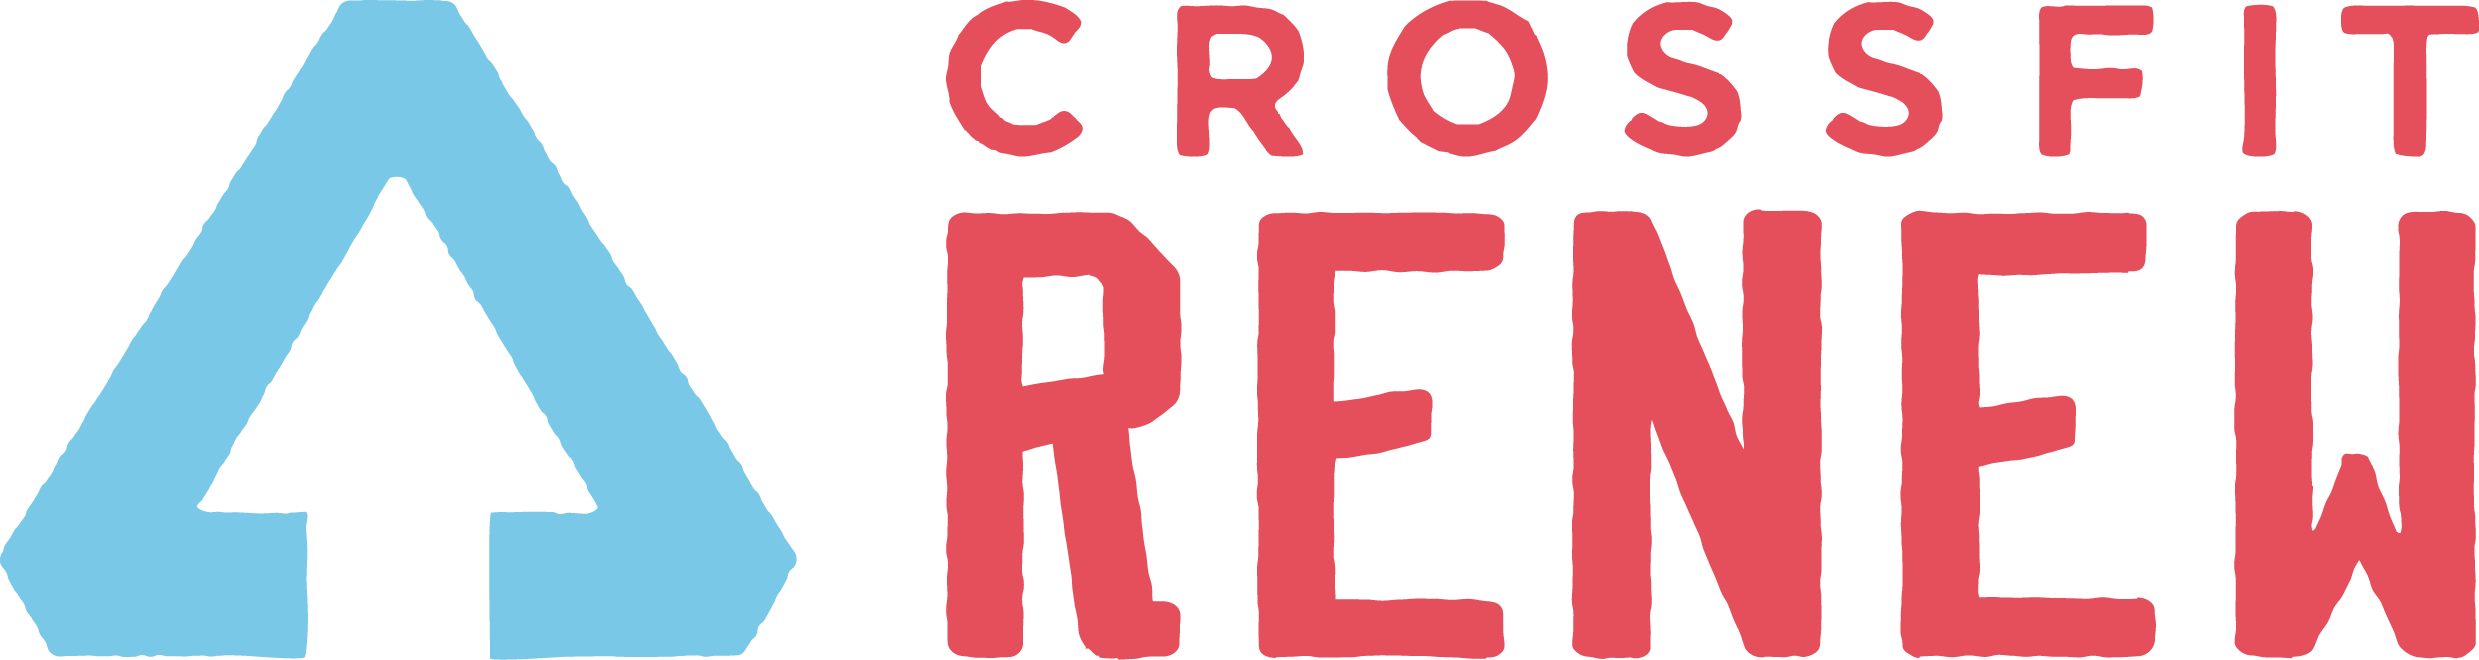 CrossFit Renew logo